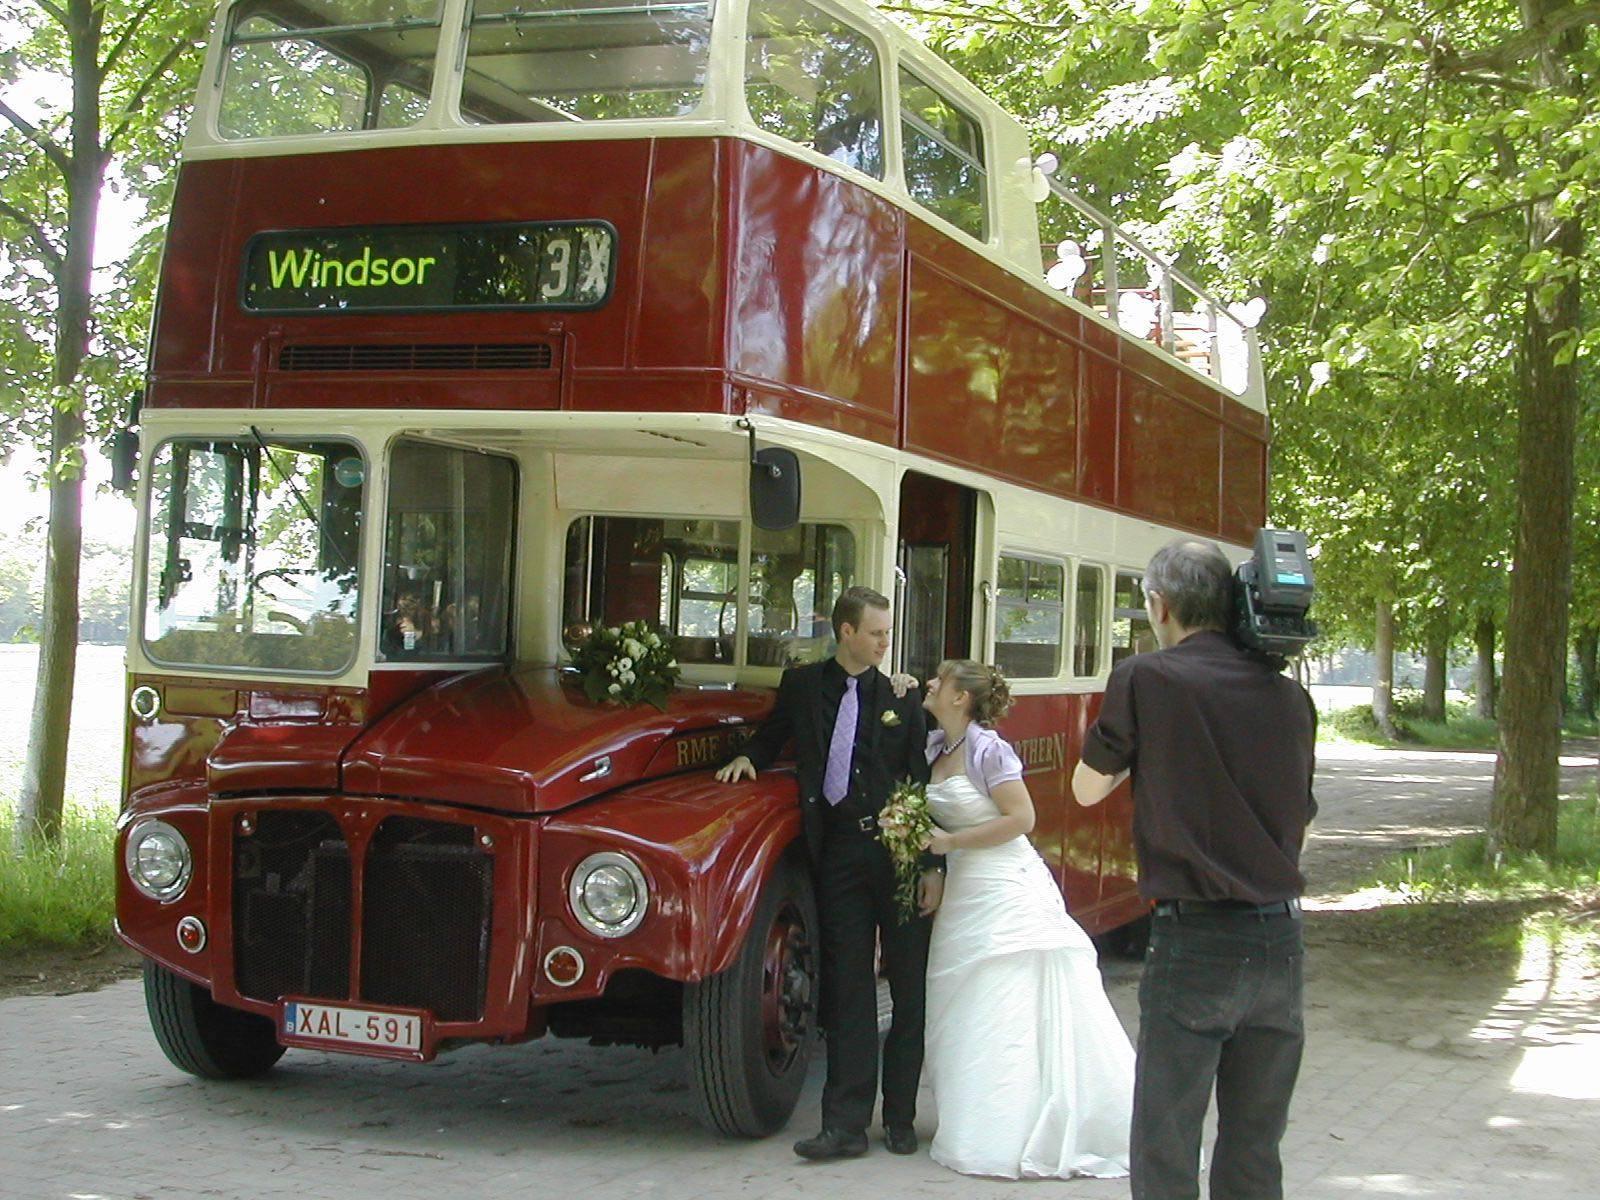 The London Ceremony Bus - Trouwvervoer - Ceremonievervoer - Bus - House of Weddings - 27